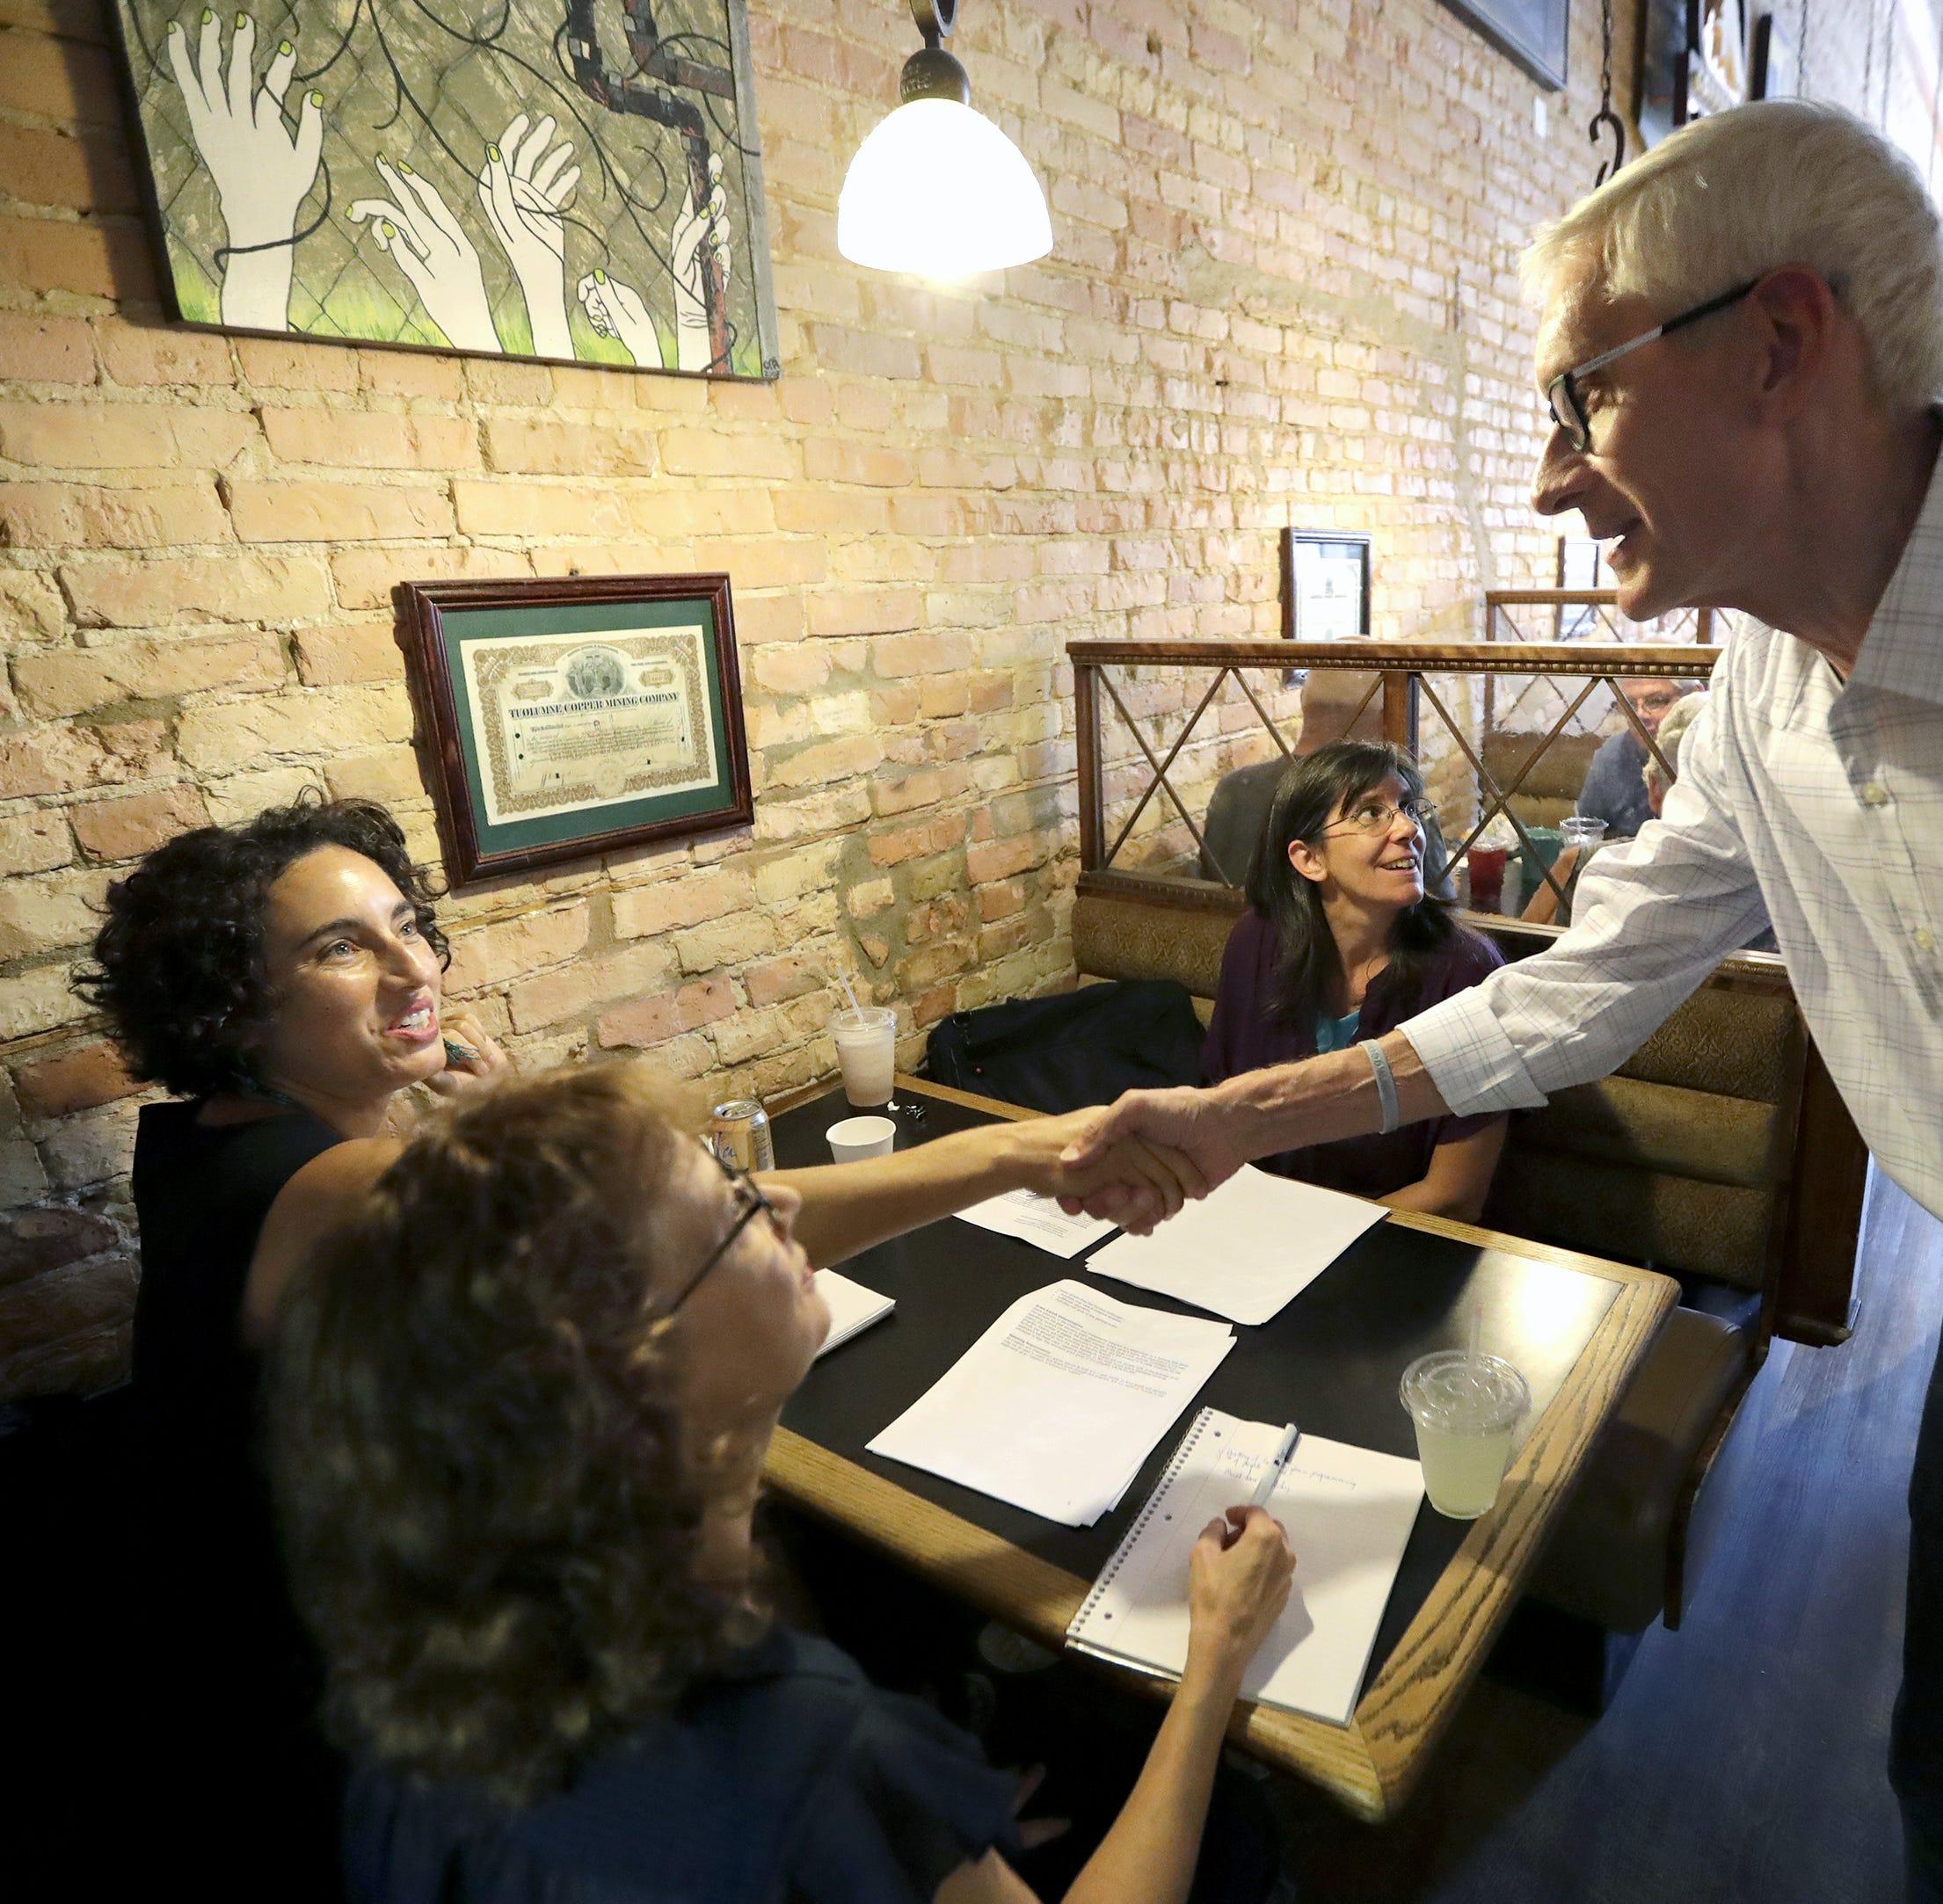 Tony Evers makes campaign swing through Appleton, criticizes Gov. Walker's performance